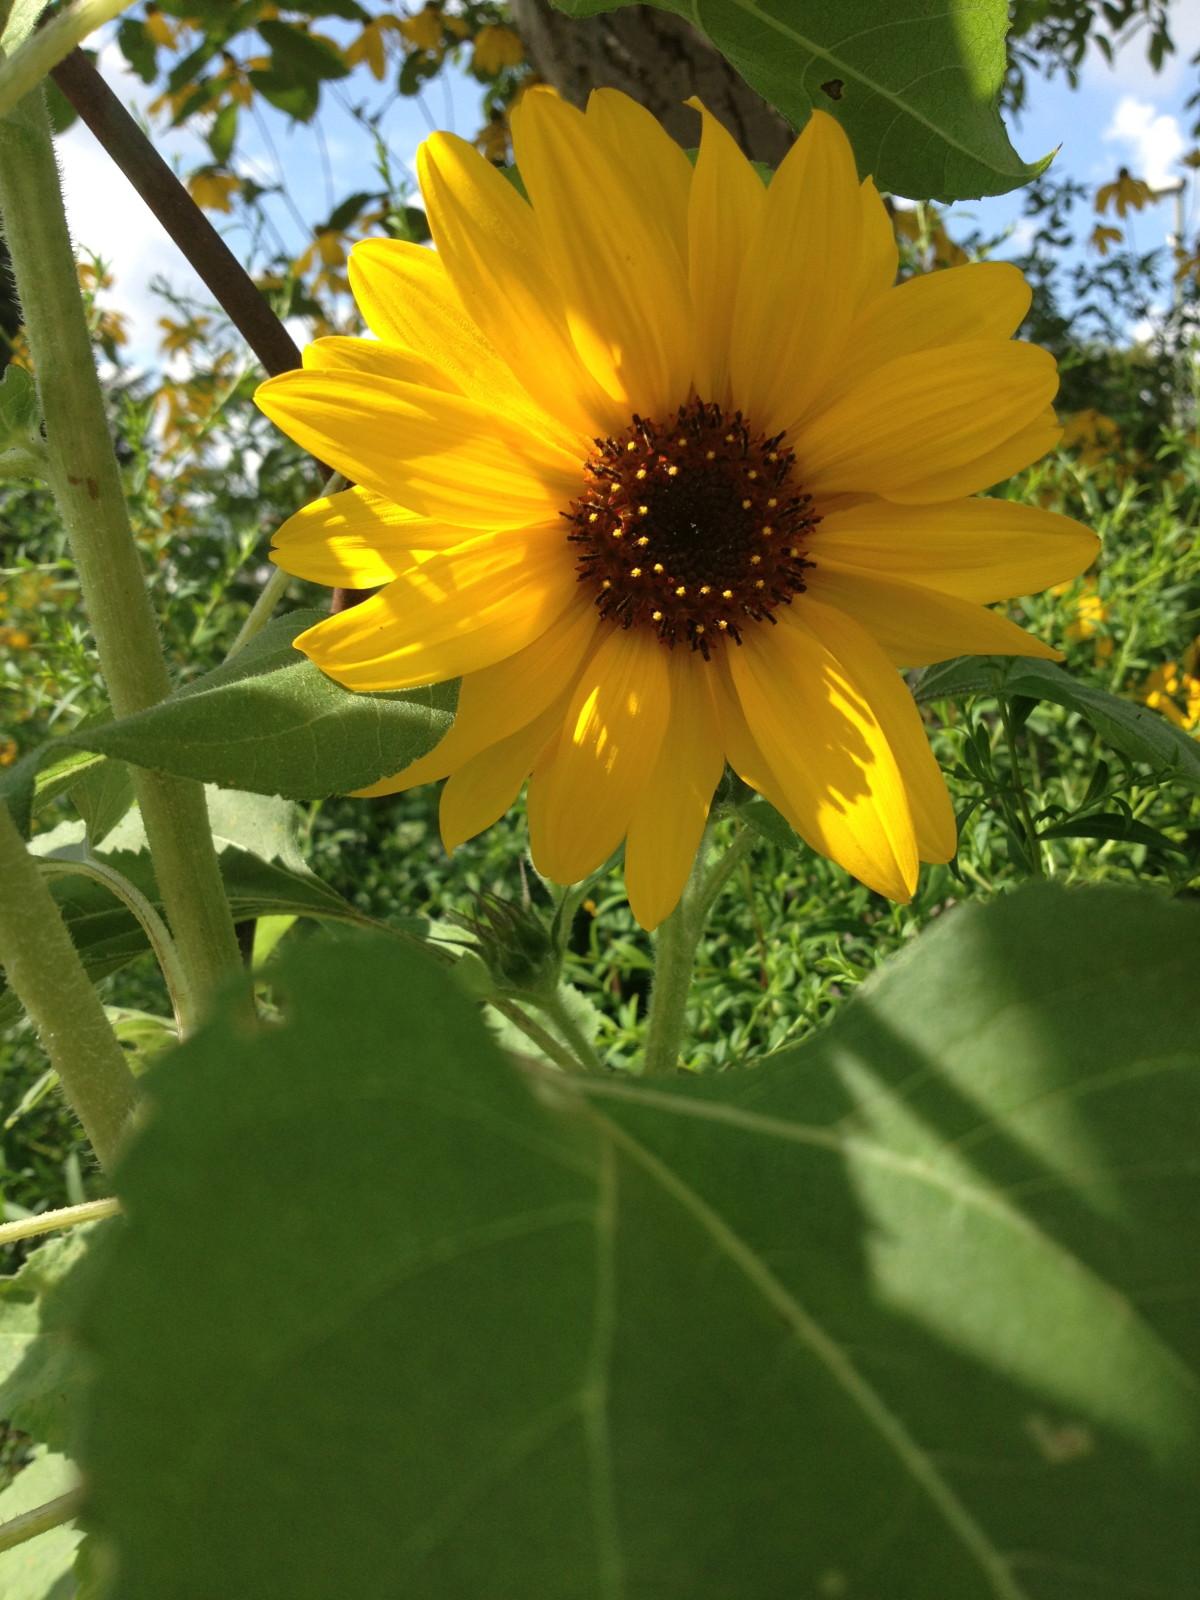 Sonnenblumen blühen Foto: Uta Richter